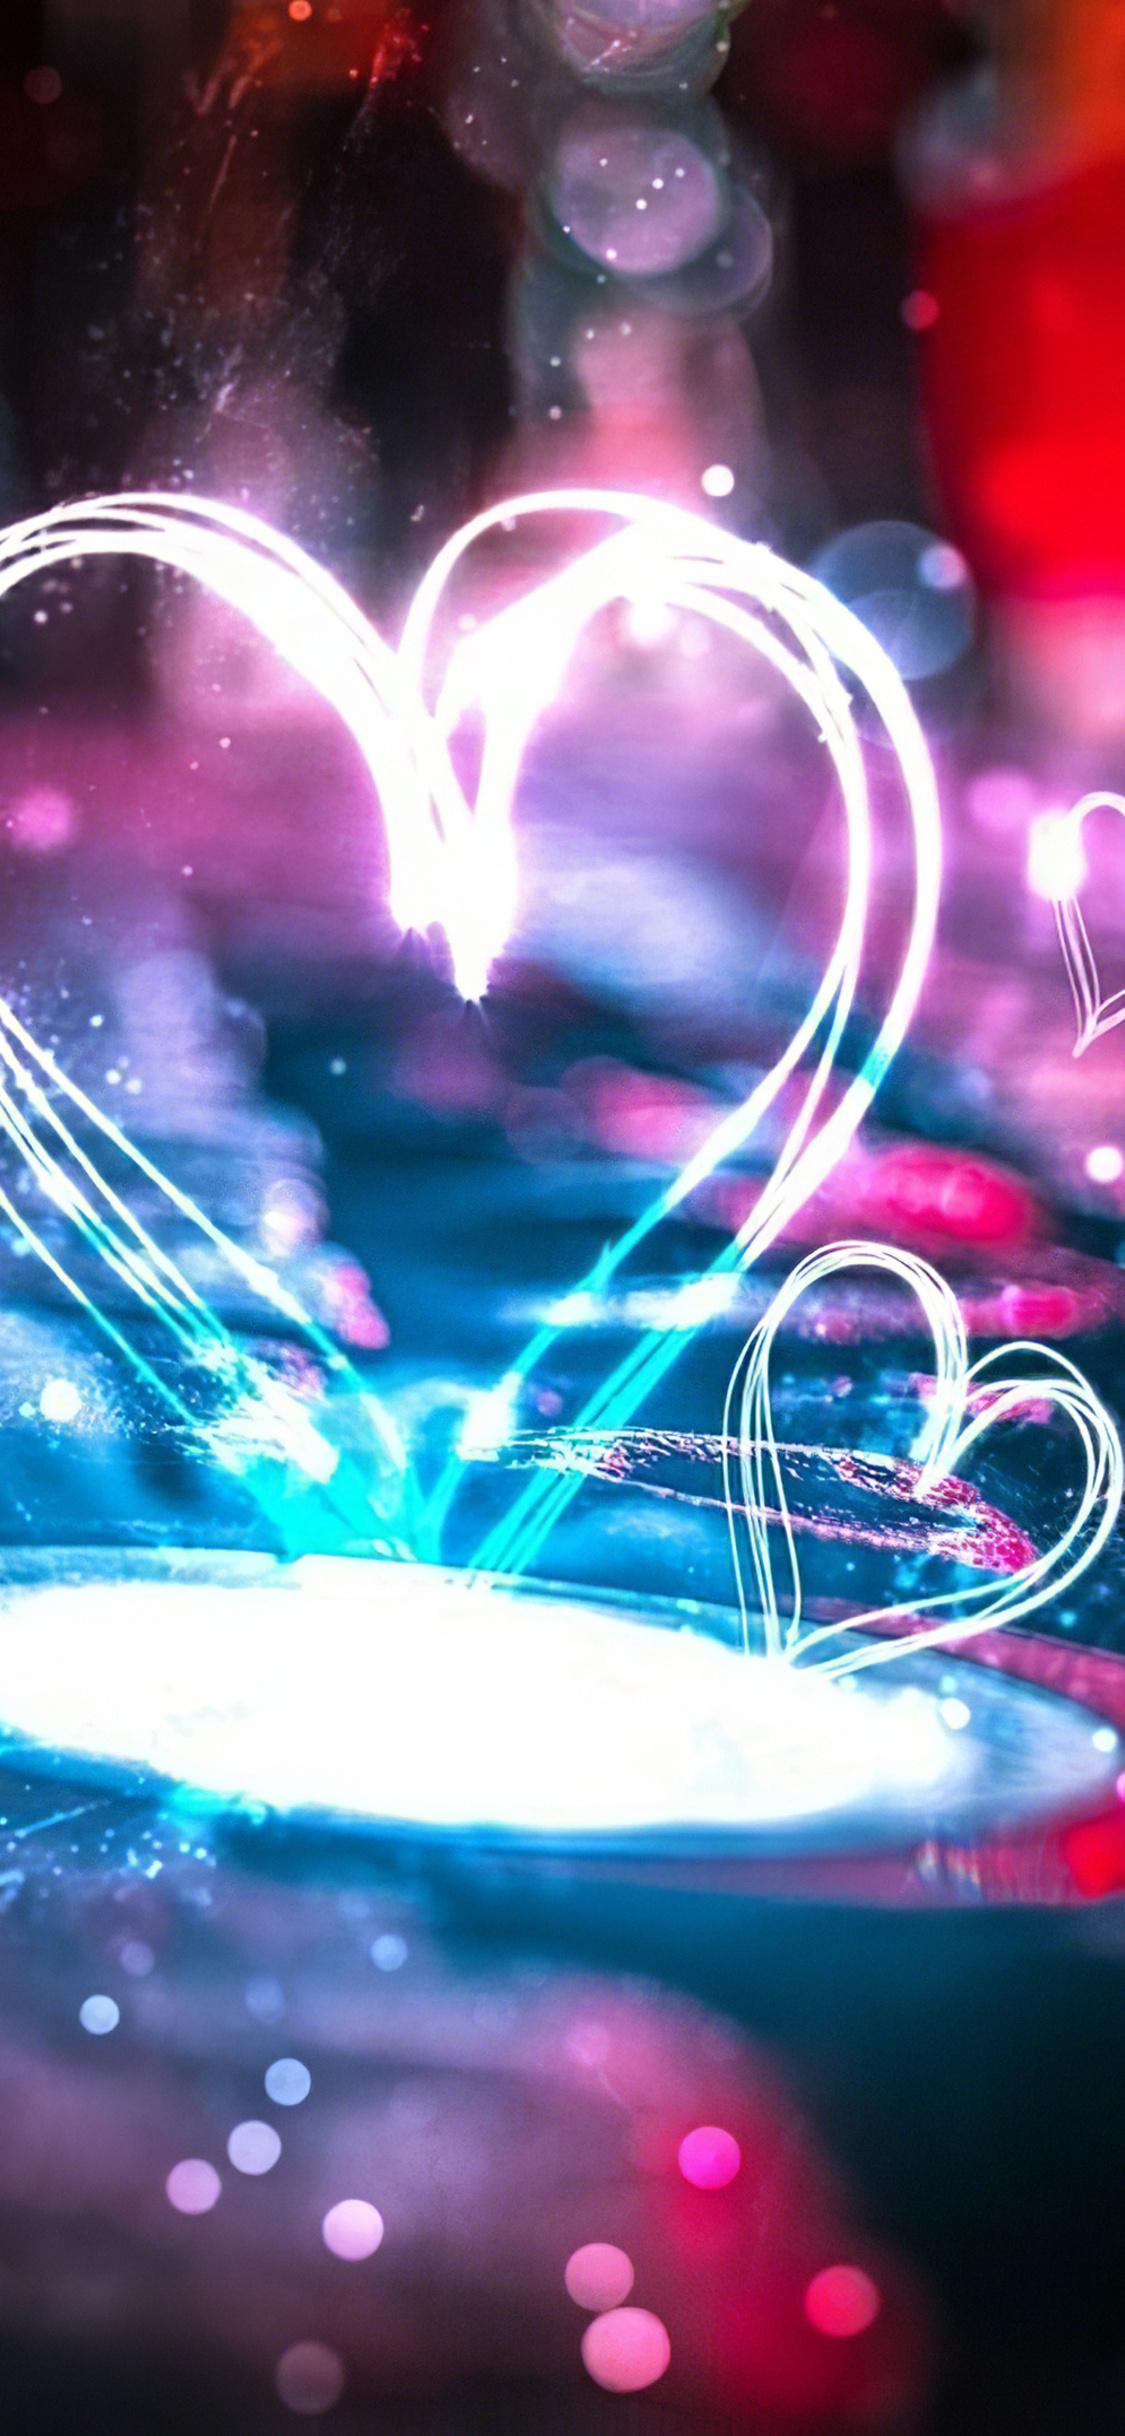 electric-love-heat-4k-ux.jpg